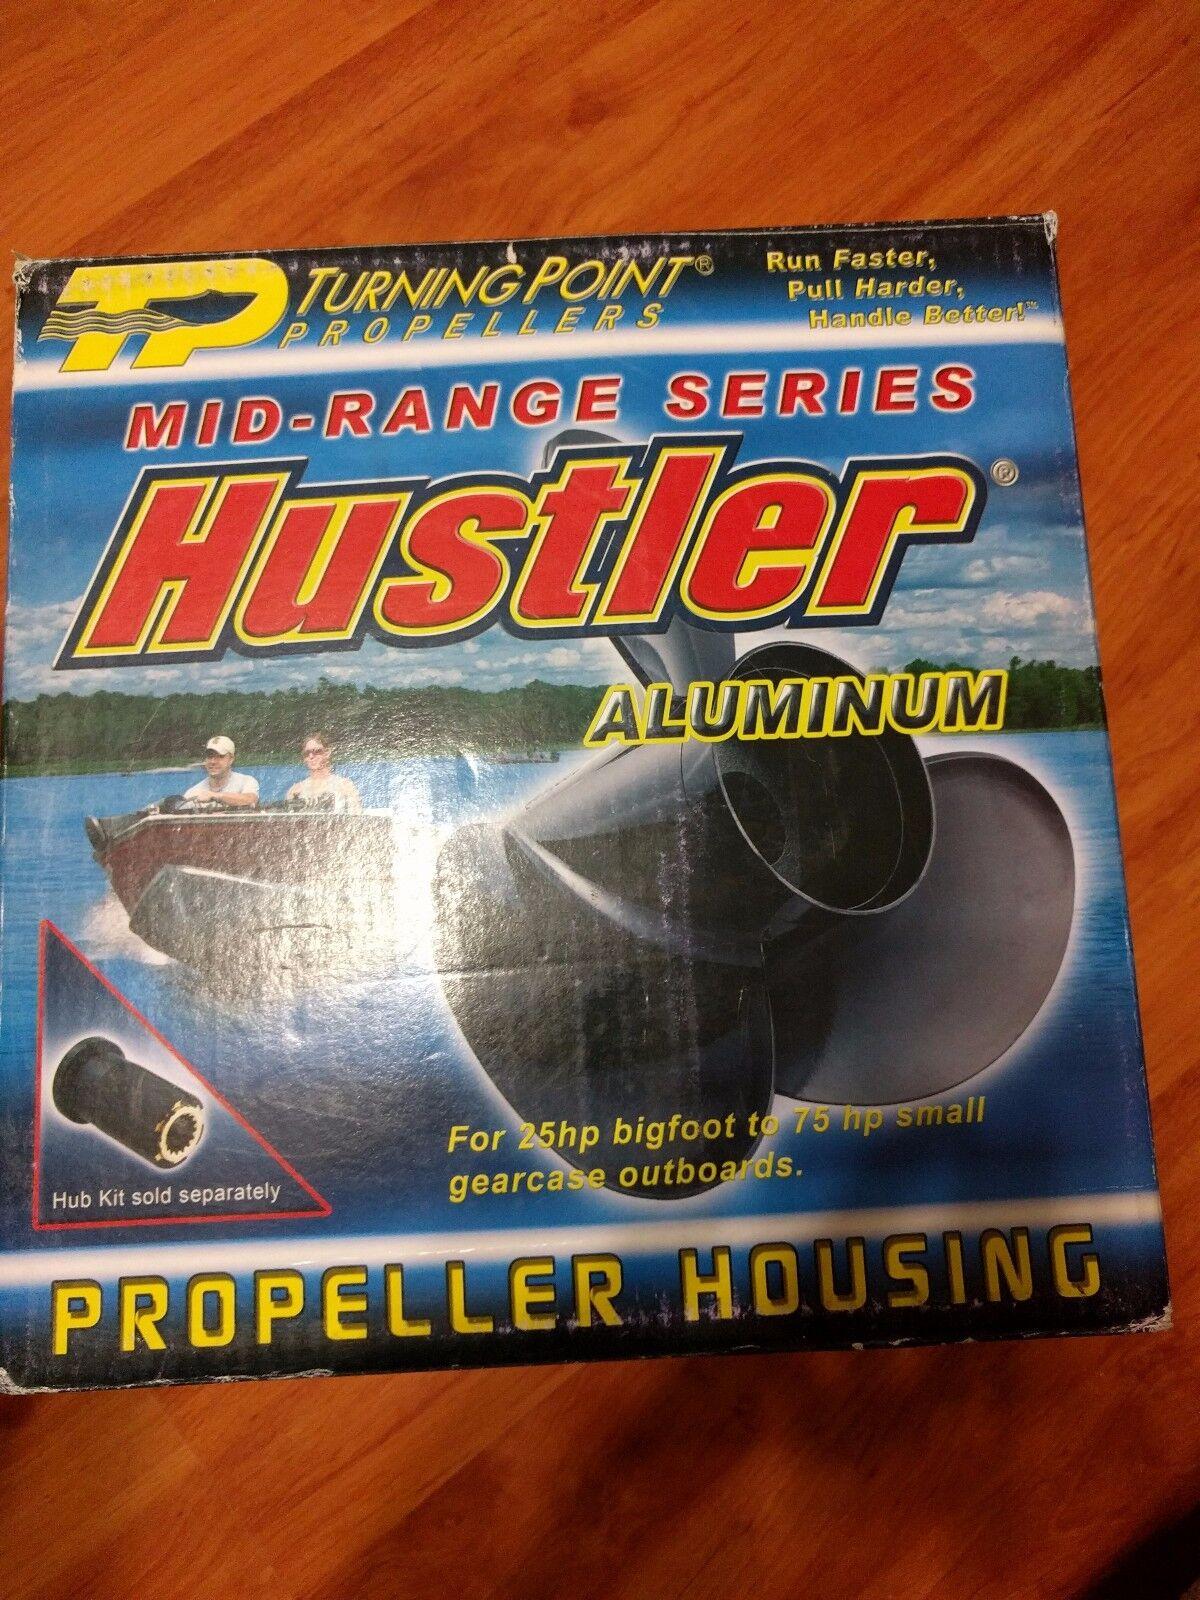 Turning Point Propellers H2-1213 Marine Hustler Mid Range